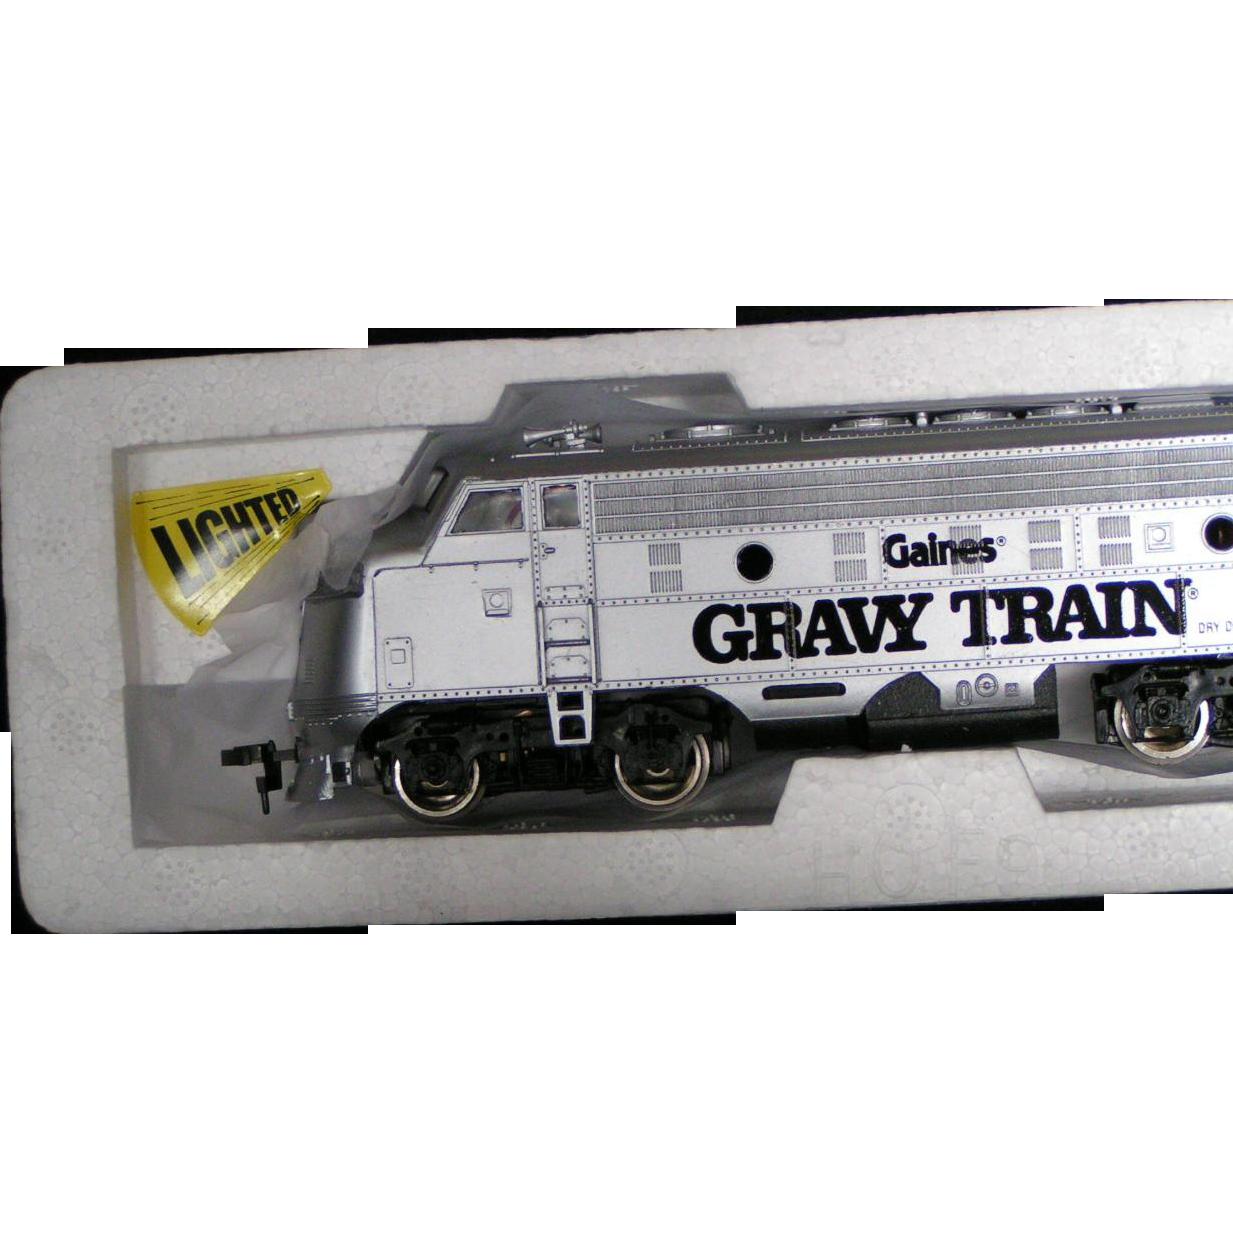 Bachman HO scale Gaines Gravy Train train set NIB